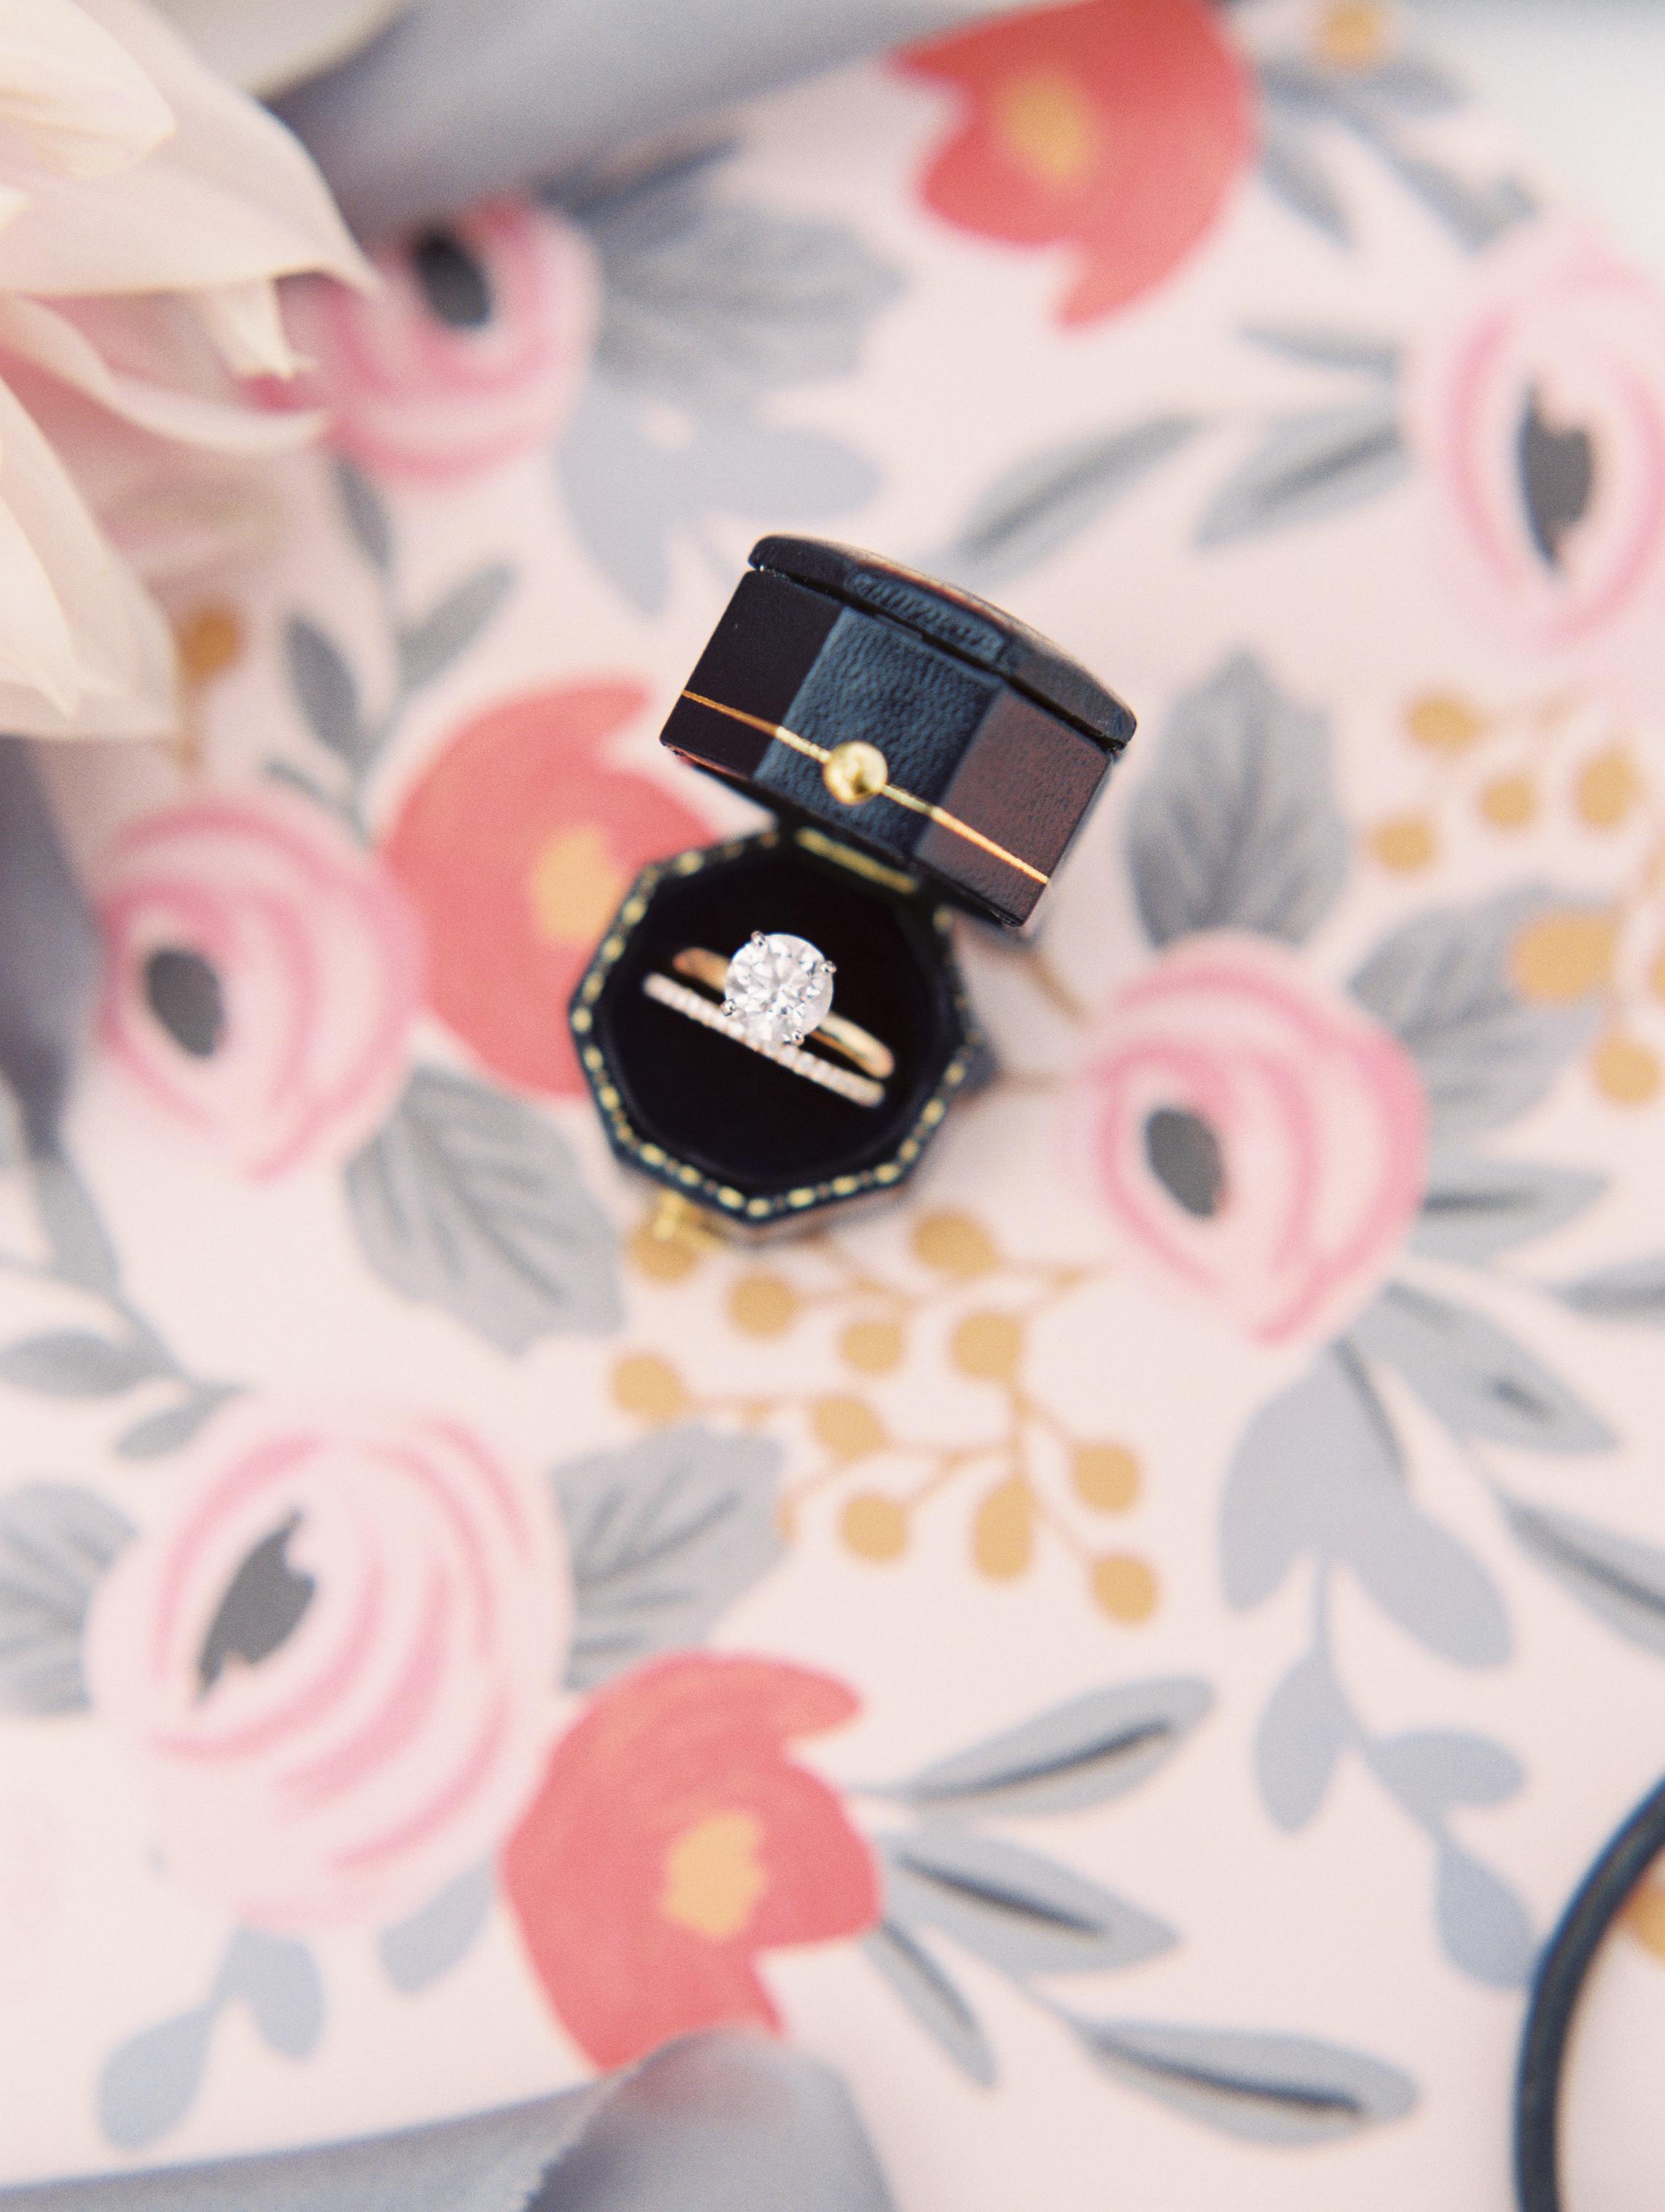 Zoller+Wedding+Details-4.jpg